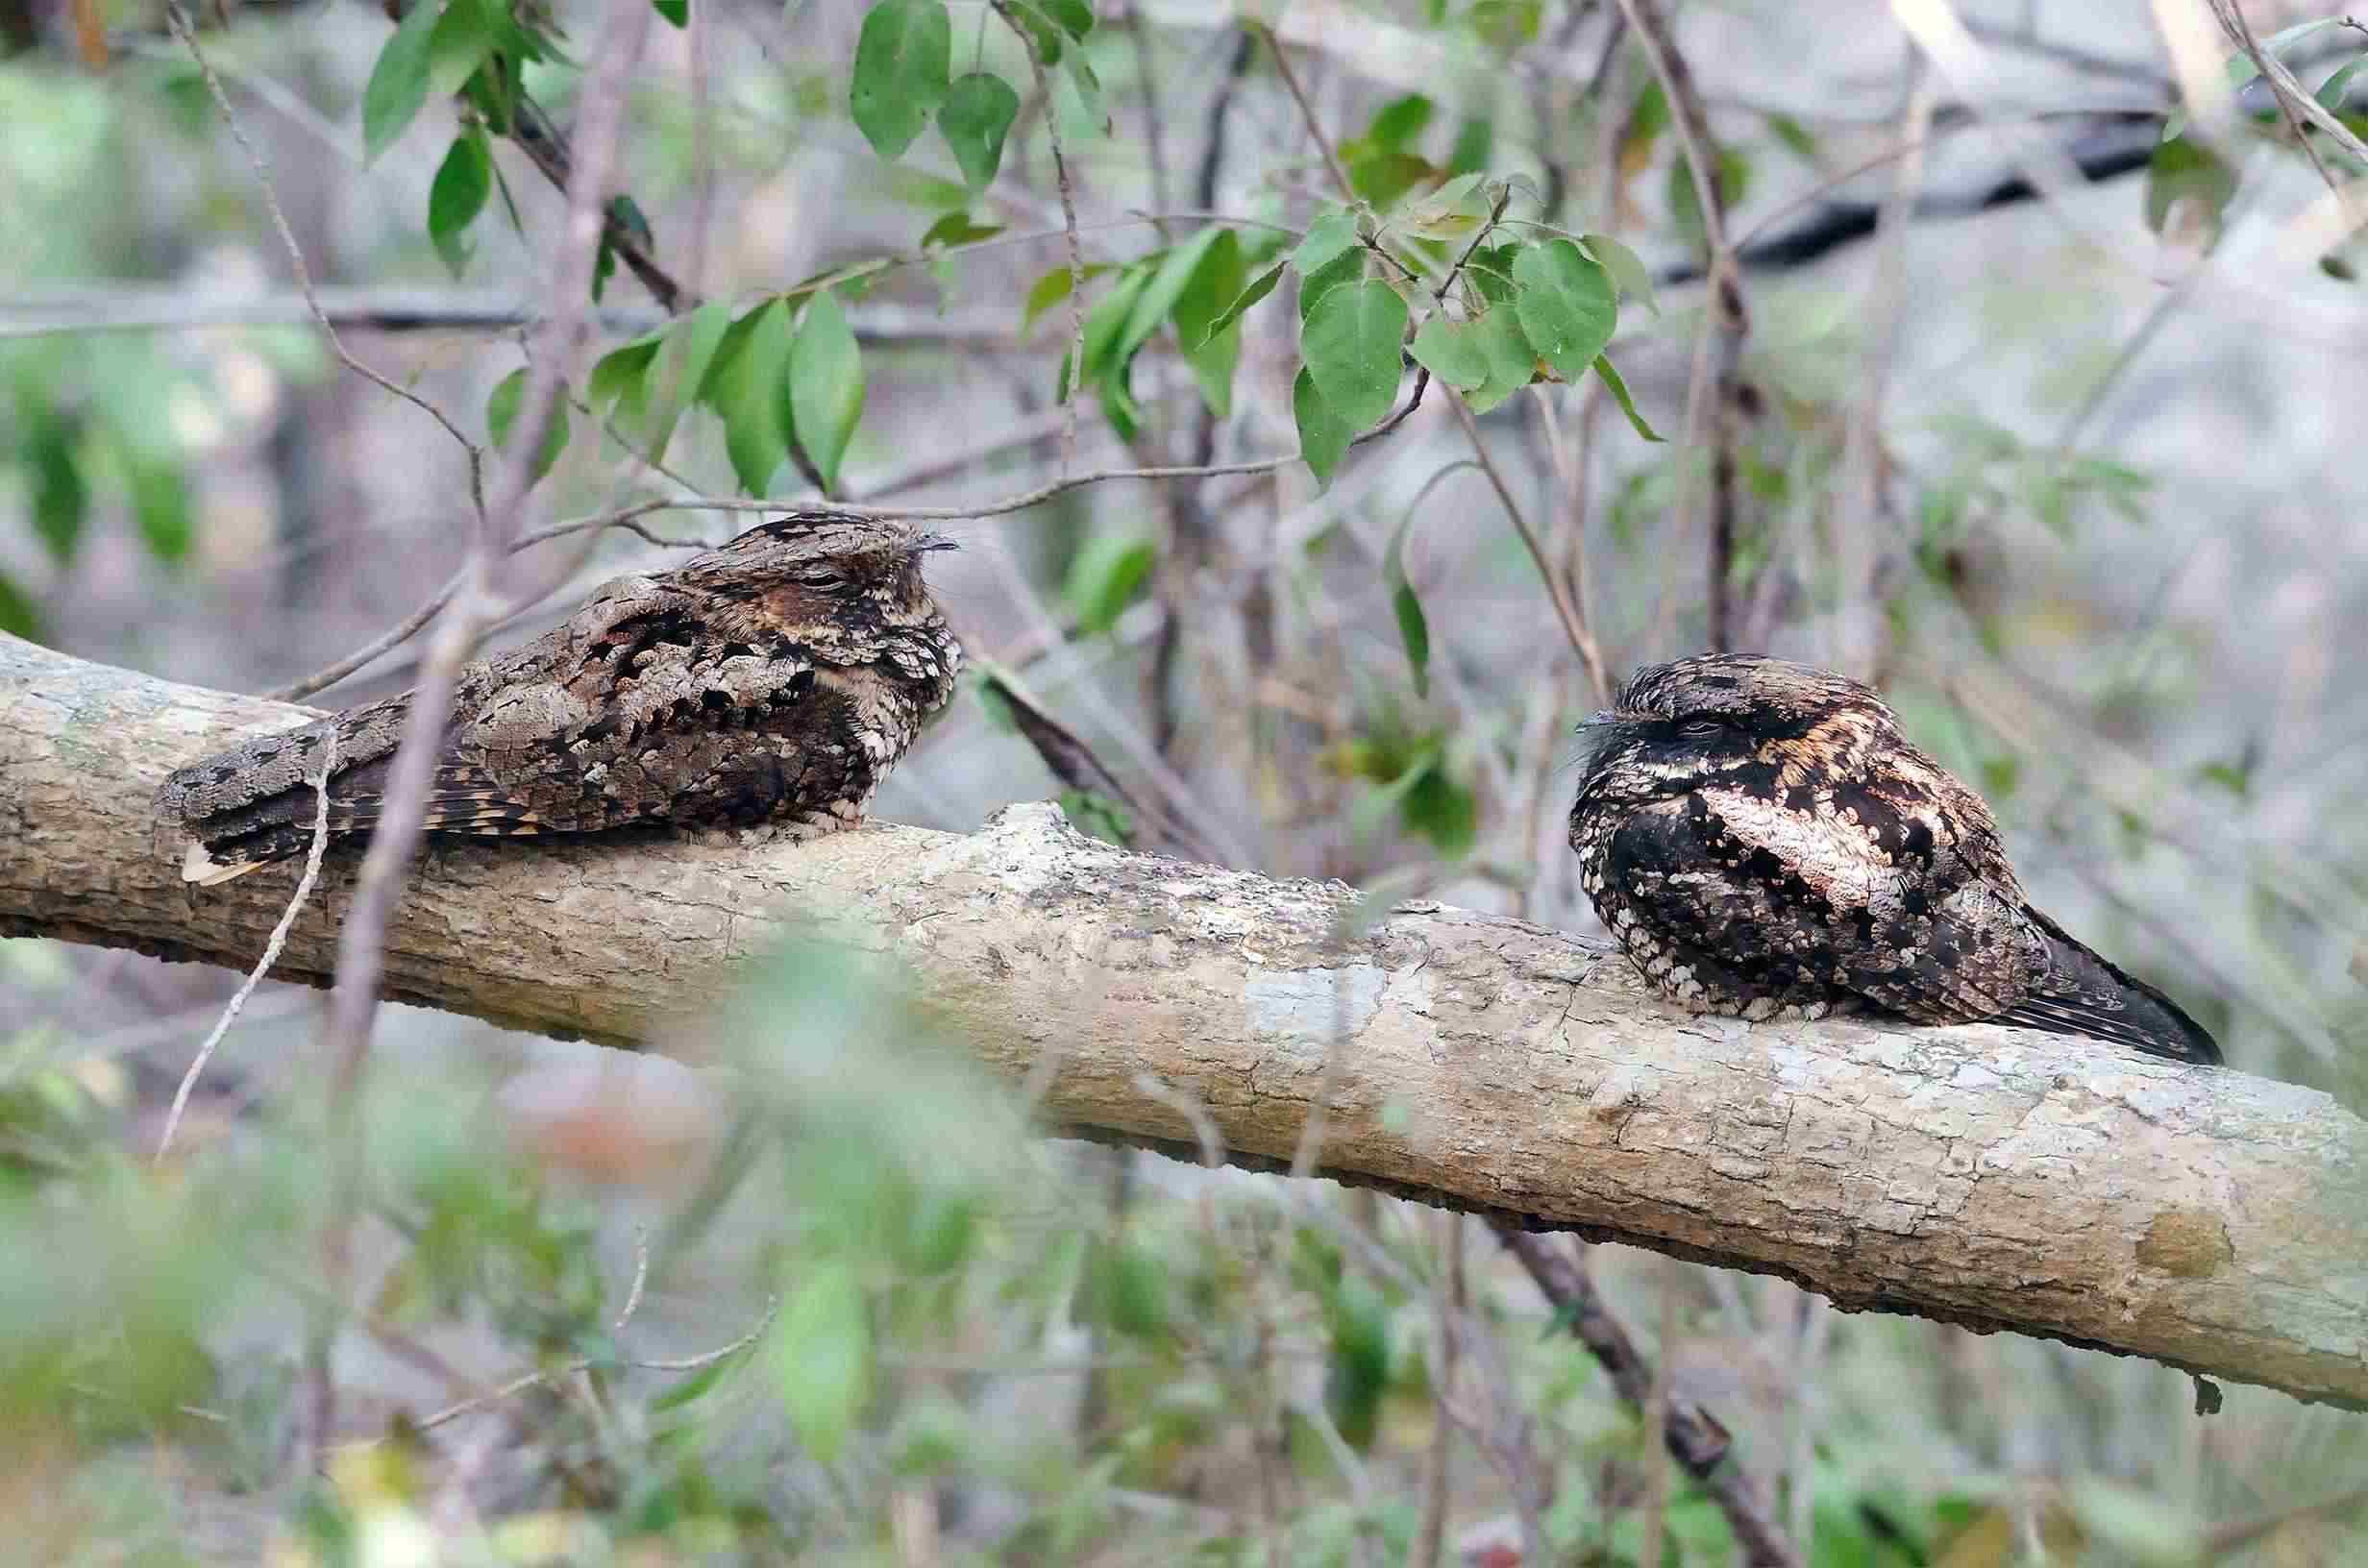 Endangered Puerto Rican nightjars